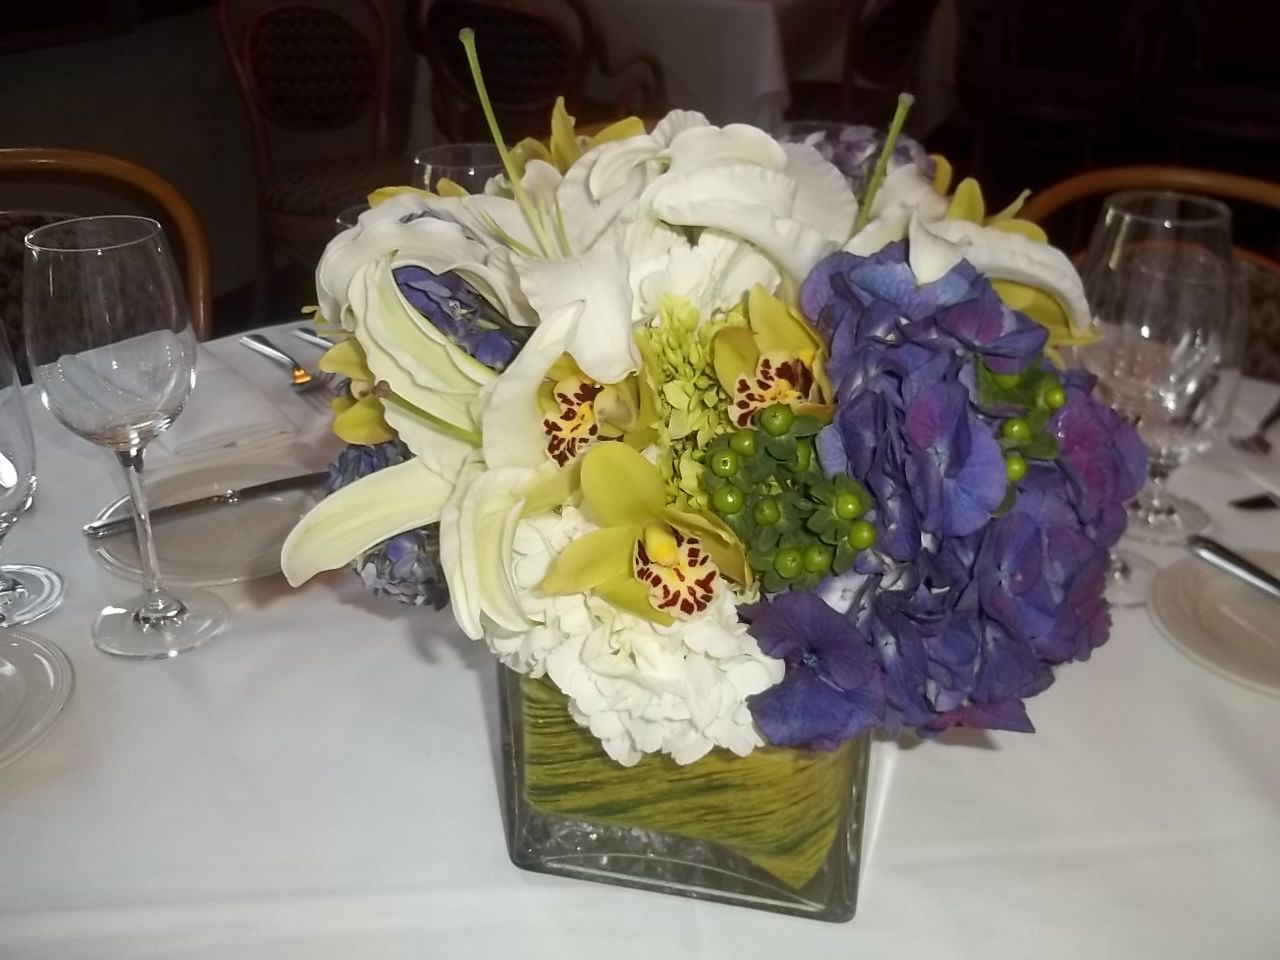 Eletragesi cymbidium orchid centerpieces images